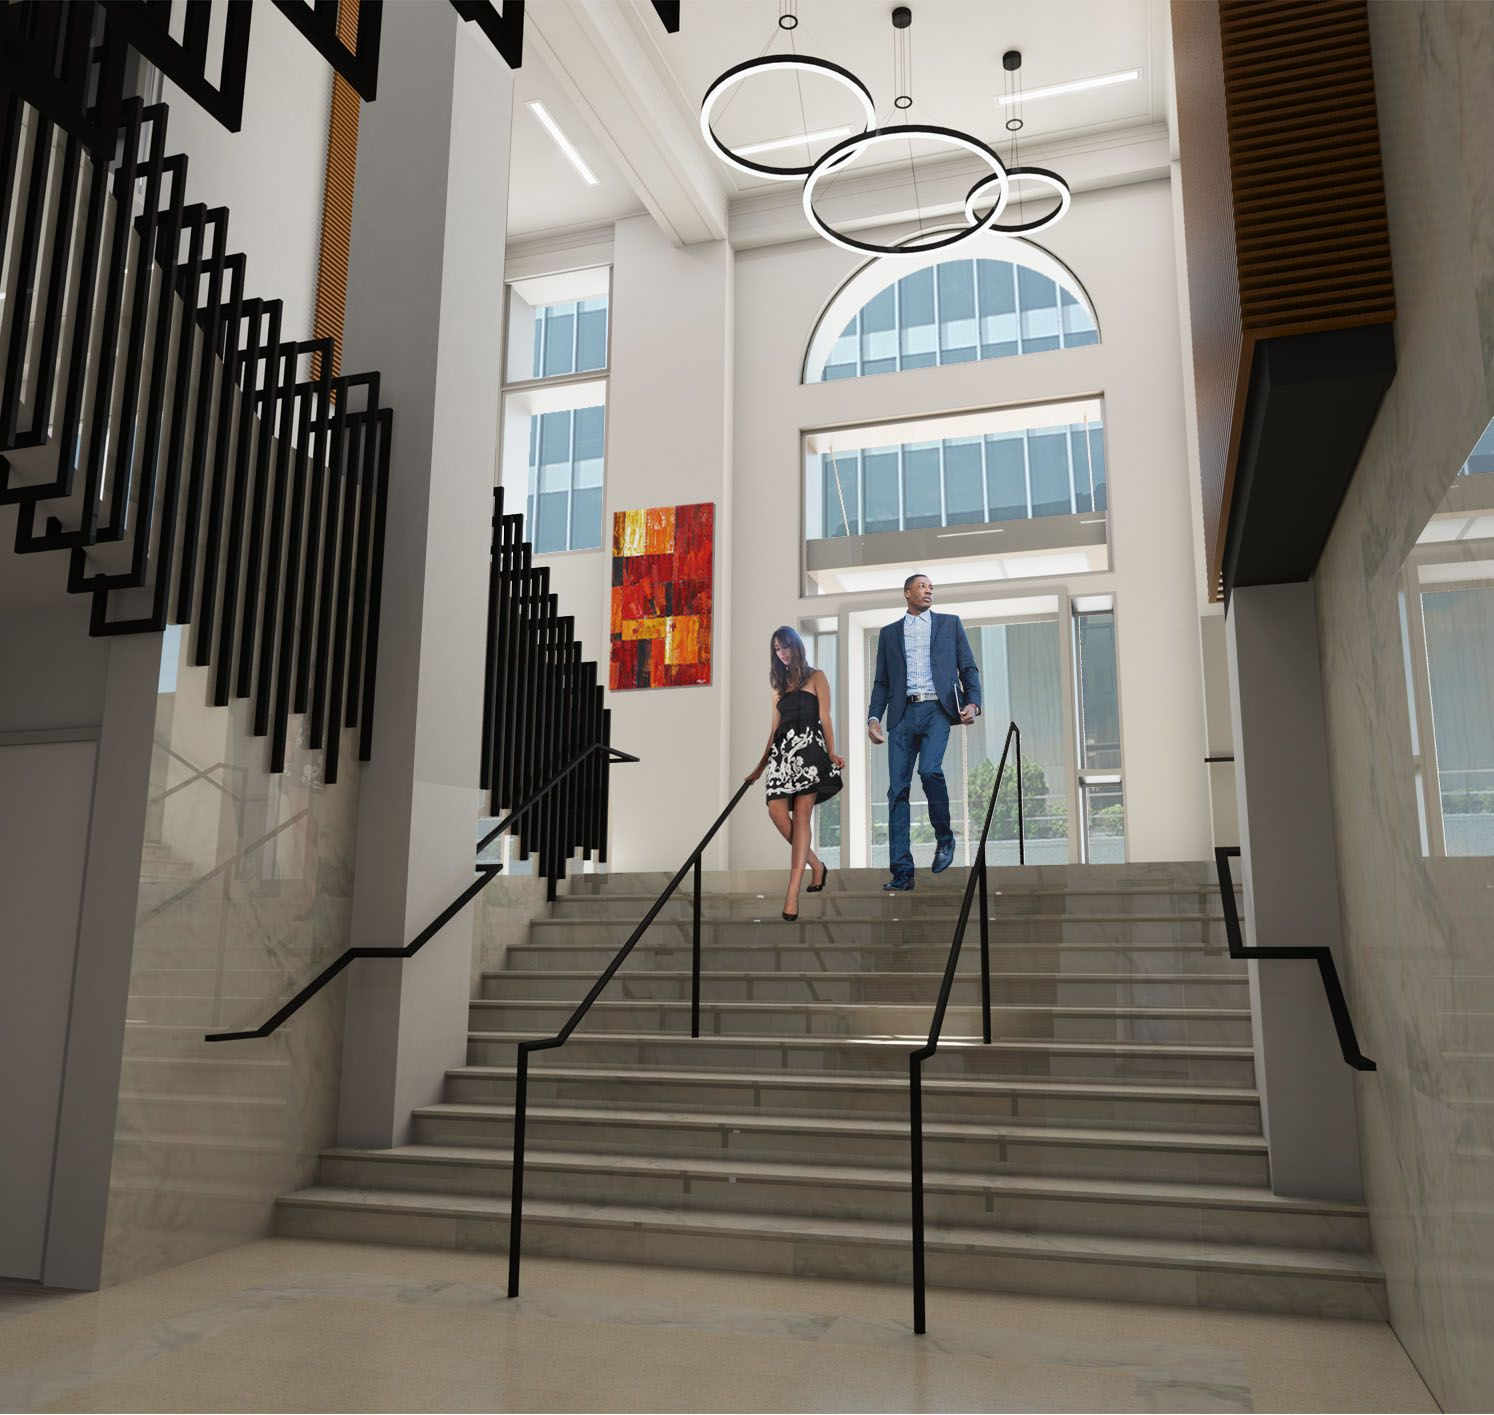 BOUTIQUE HOTEL NAPOLEON MEMPHIS TENNESSEE HISTORIC RENOVATION MODERN Architecture Interior DesignModern